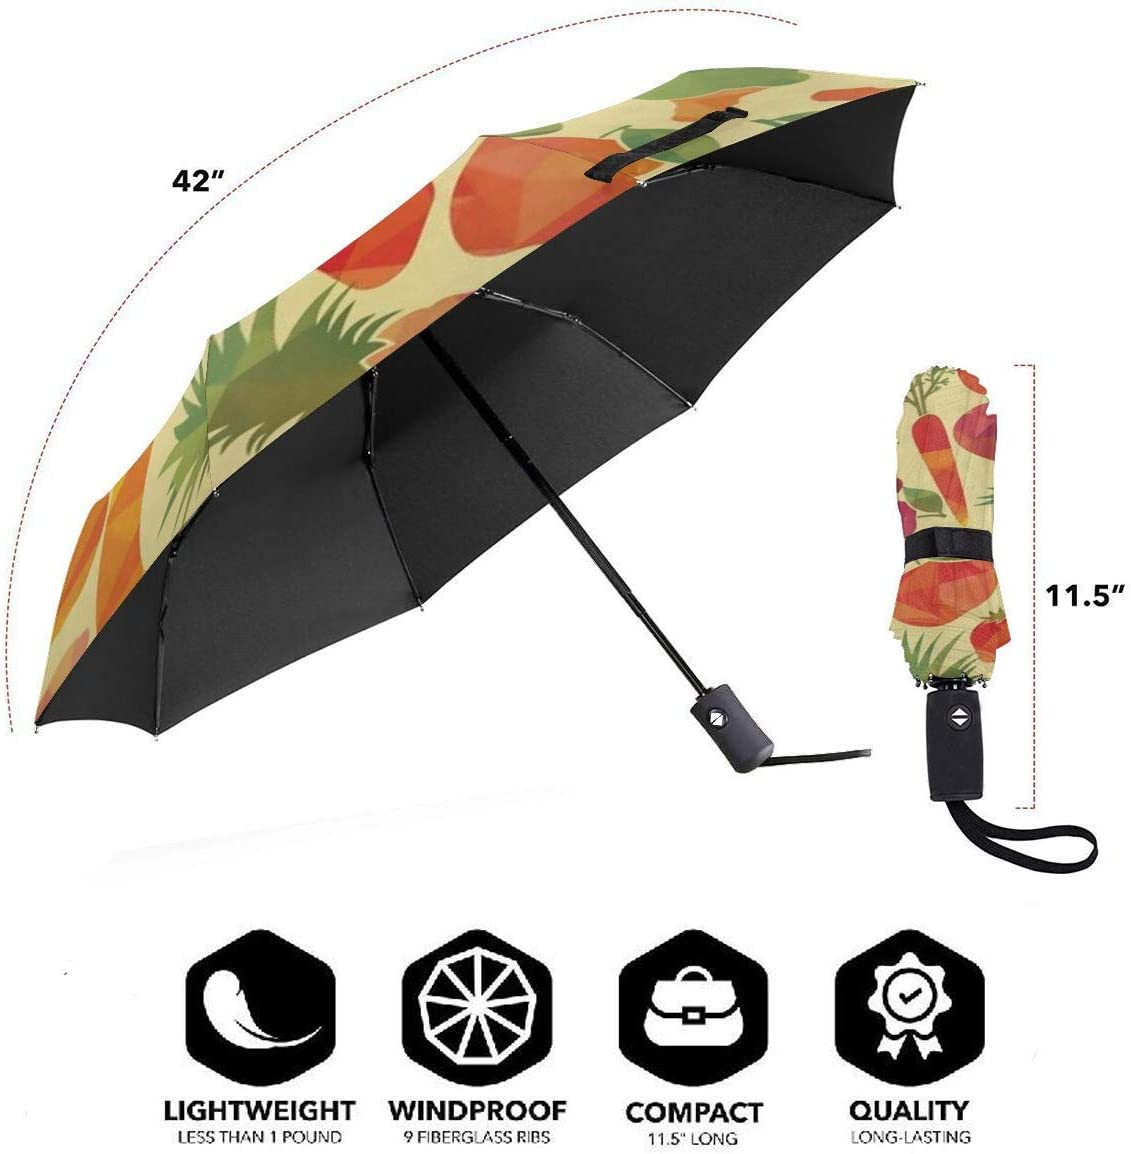 Windproof Reinforced Canopy Ergonomic Handle Auto Open//Close Multiple Colors Fruits Compact Travel Umbrella